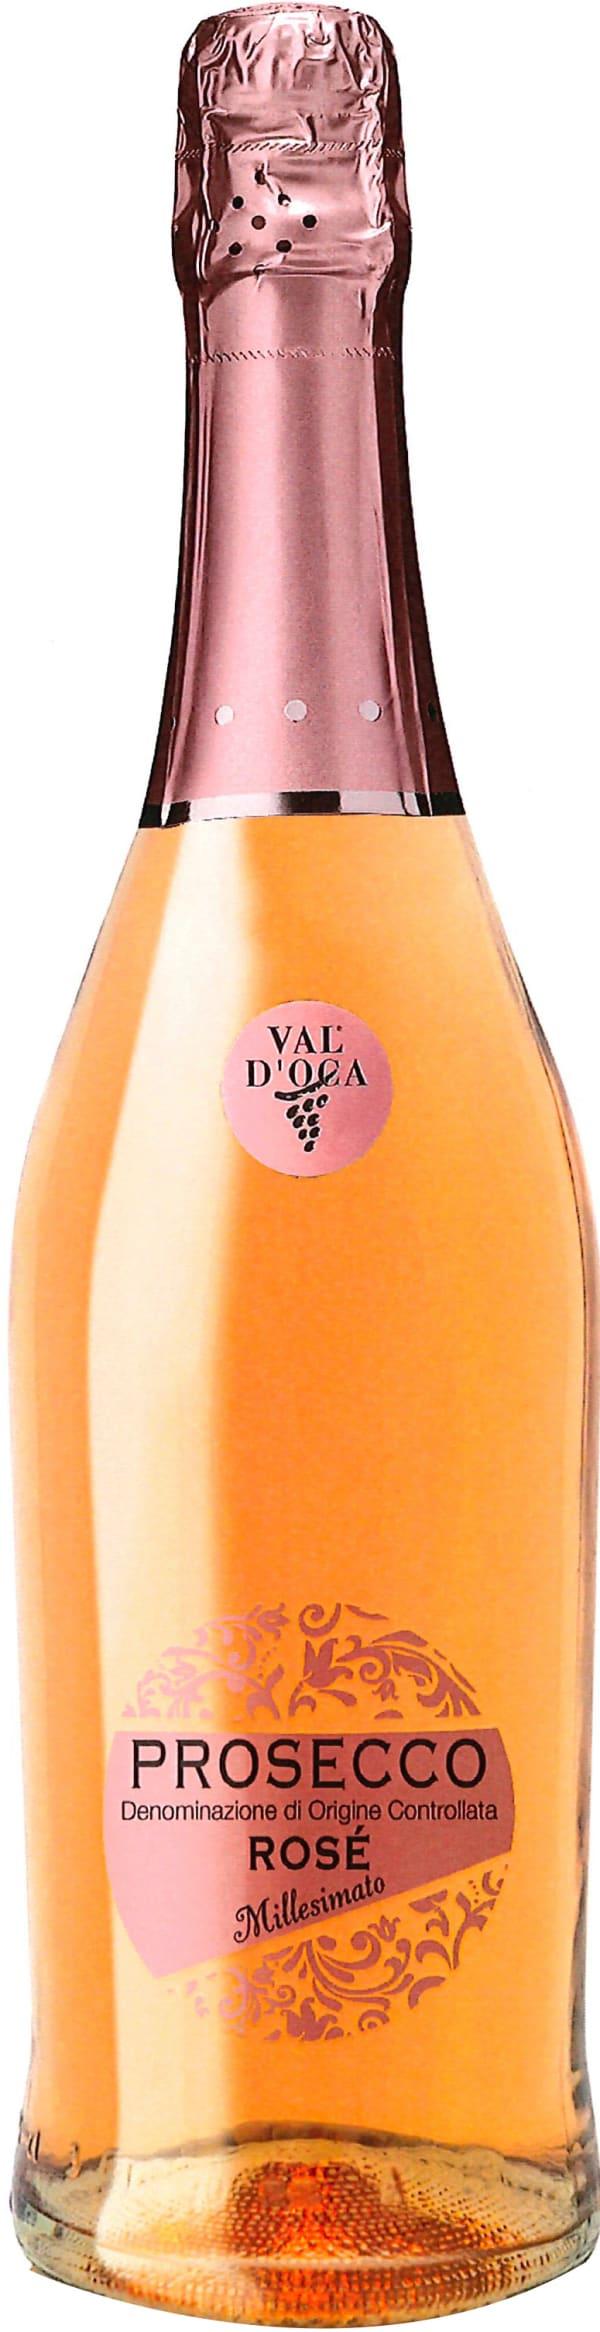 Val d'Oca Prosecco Rosé Extra Dry 2019